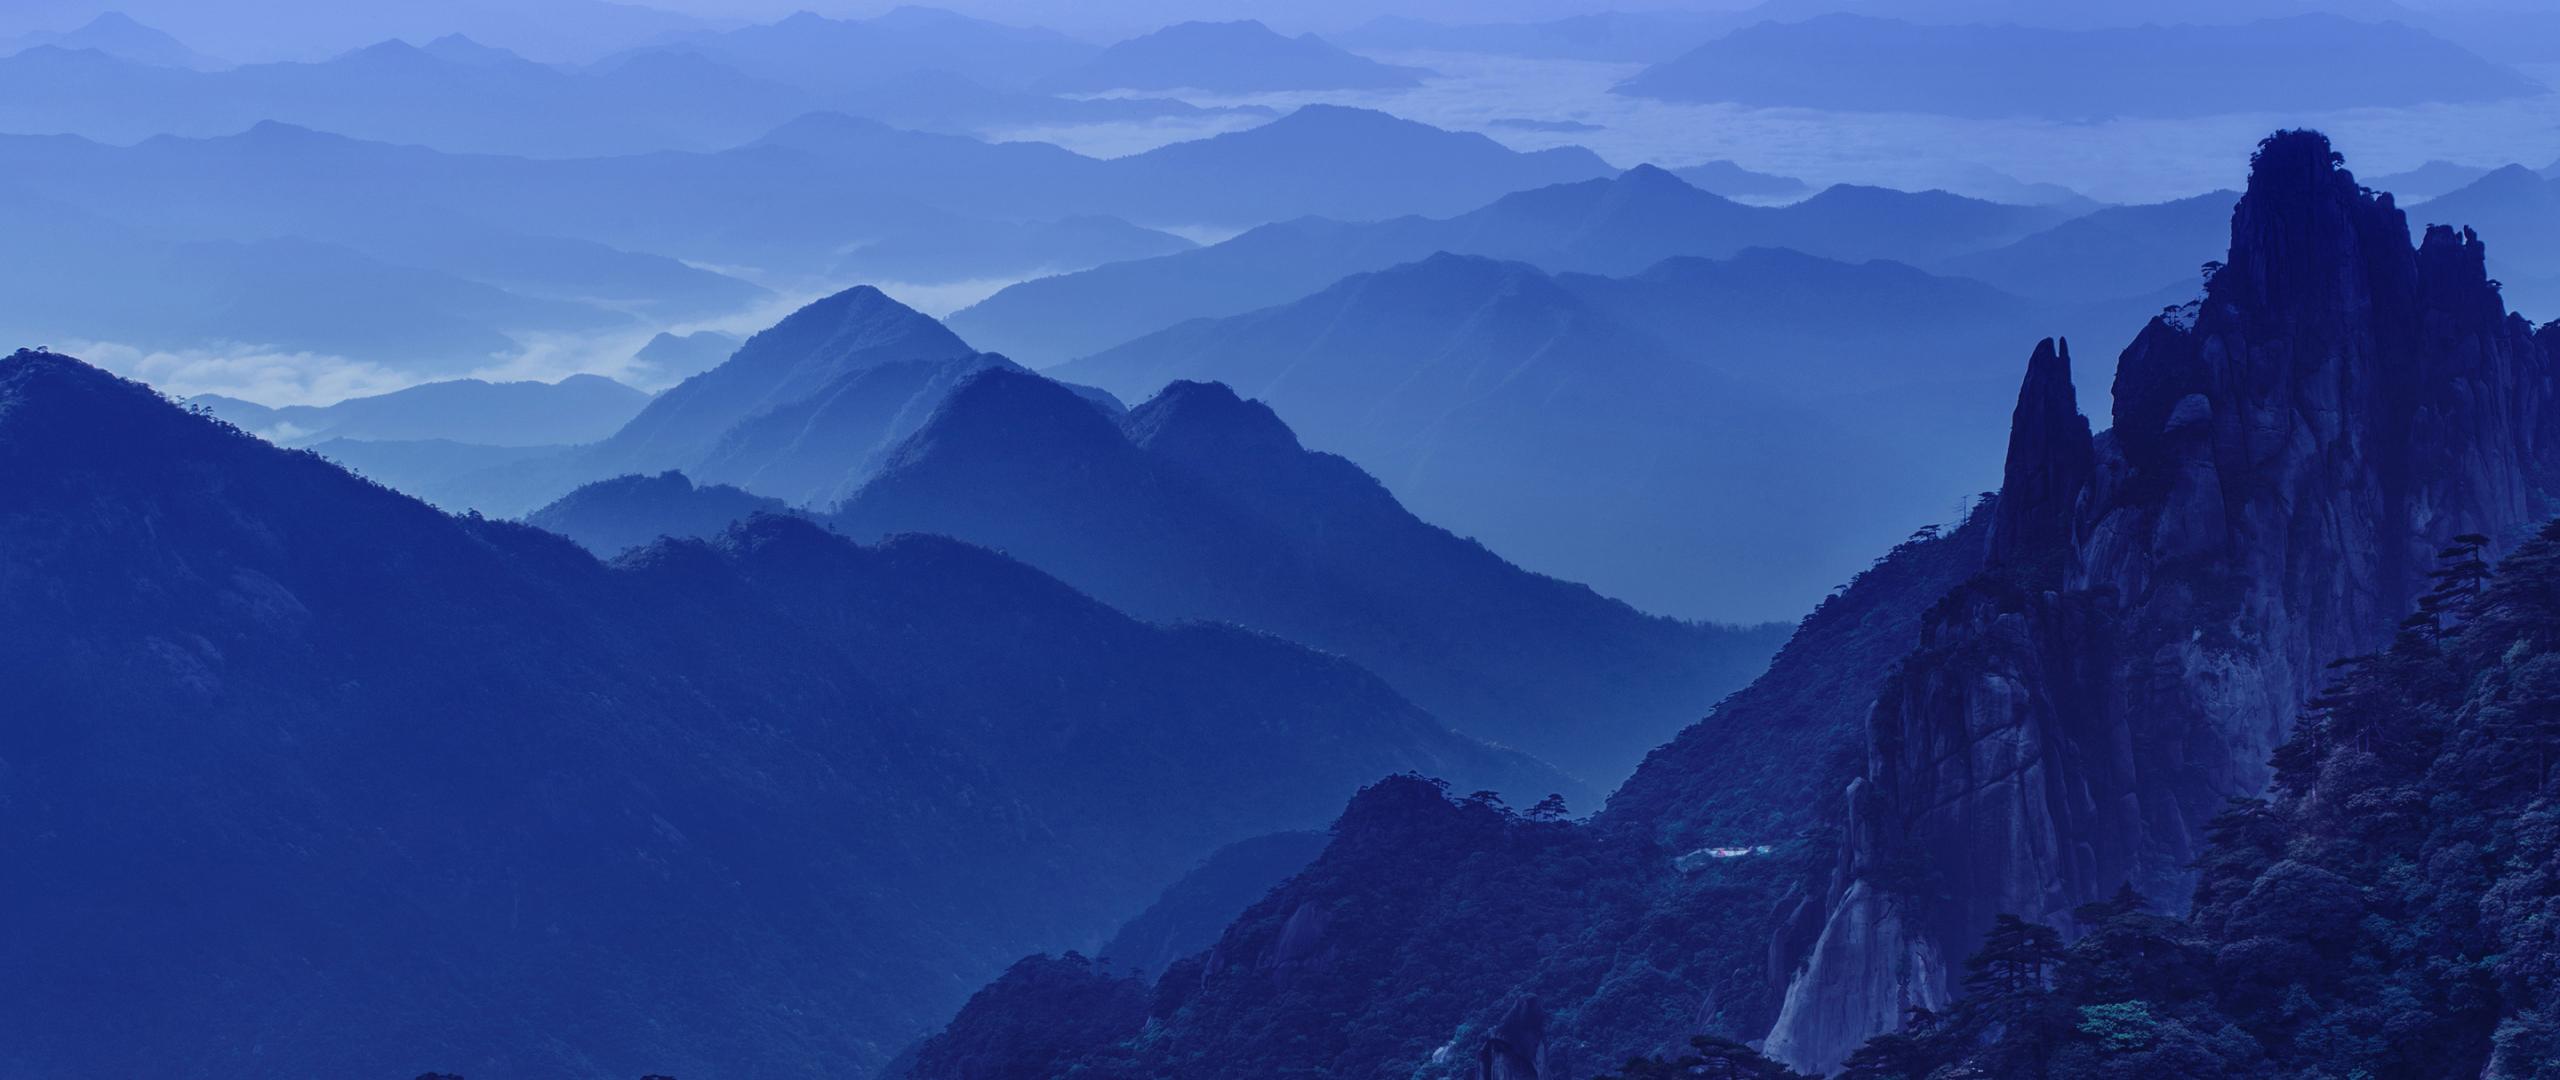 Wallpaper Guitar Dark Background Huawei Mate 10 Stock: Huawei Mate 10 Cold Night Mountains Stock, Full HD 2K